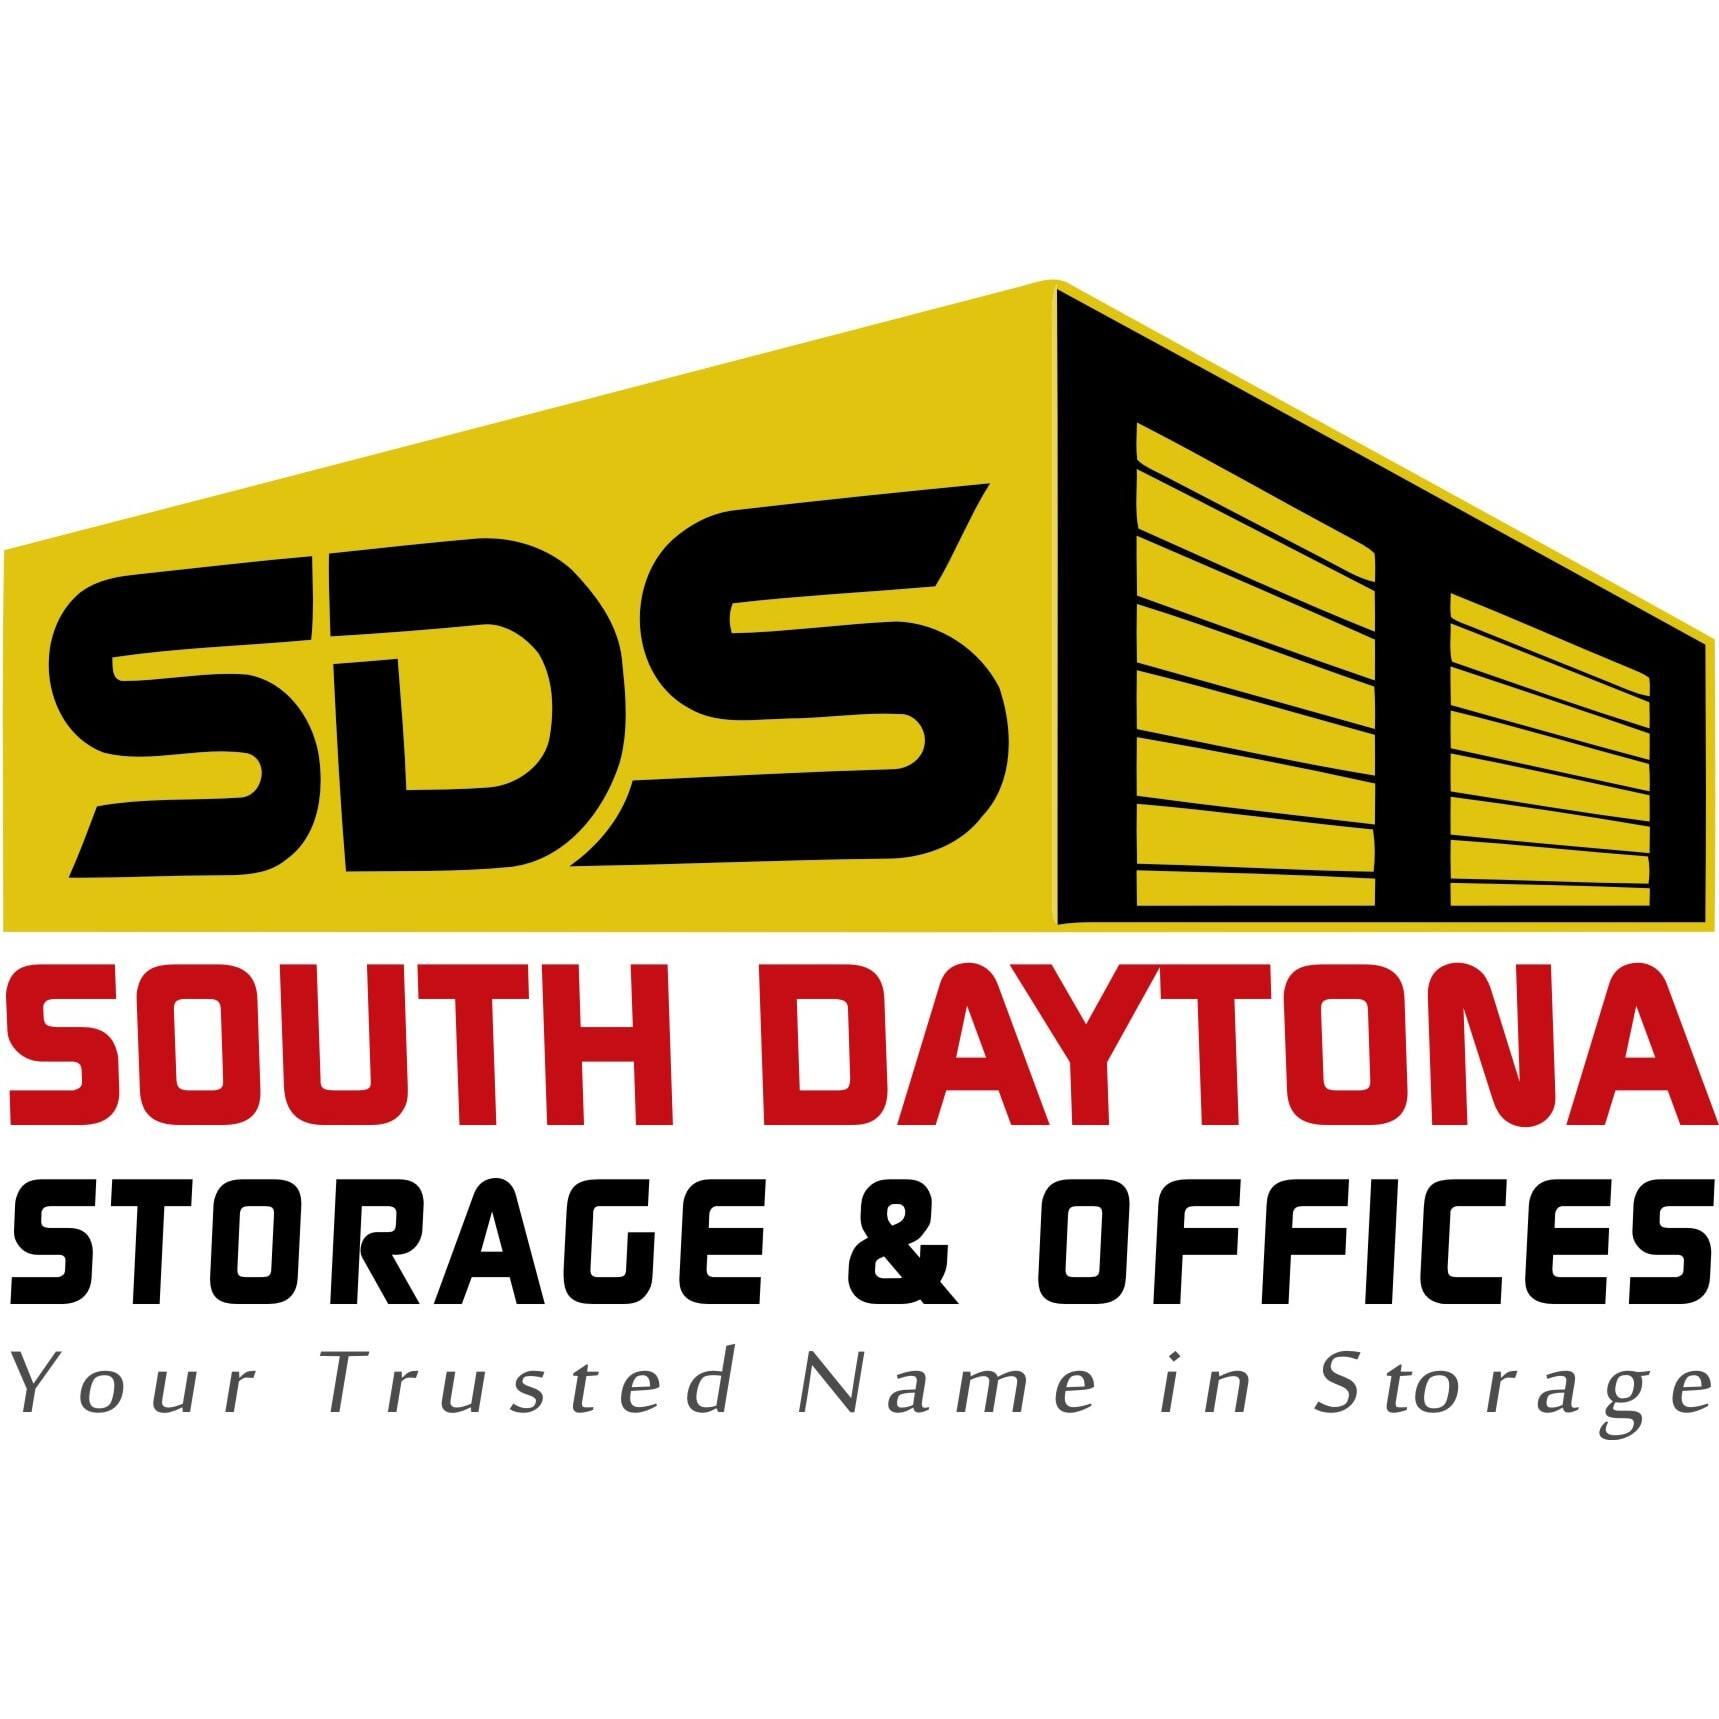 South Daytona Storage & Offices - South Daytona, FL 32119 - (386)244-7953 | ShowMeLocal.com